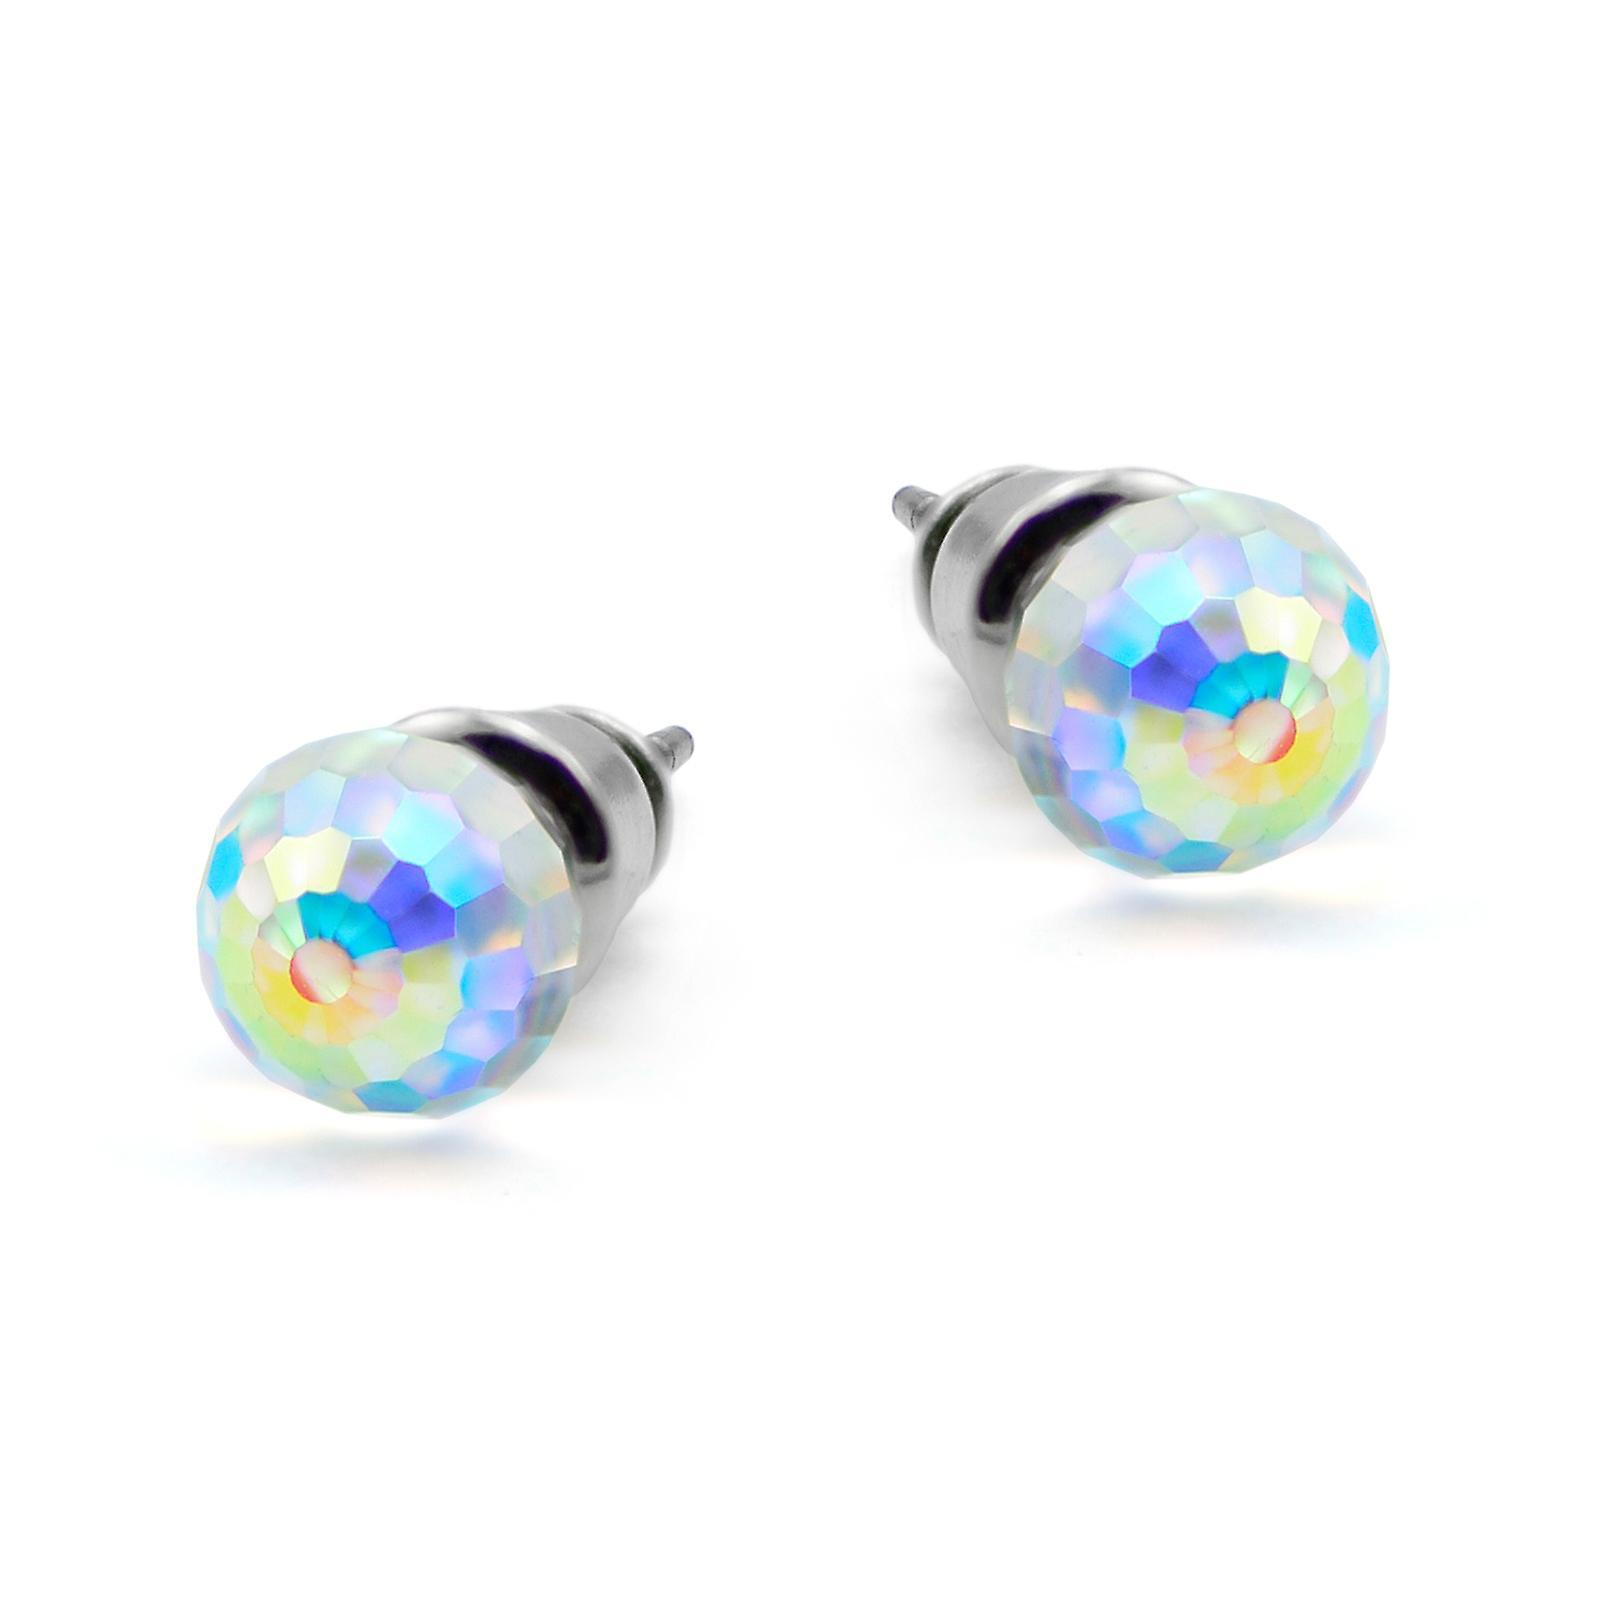 Aurora krystall øredobber EMB12.6